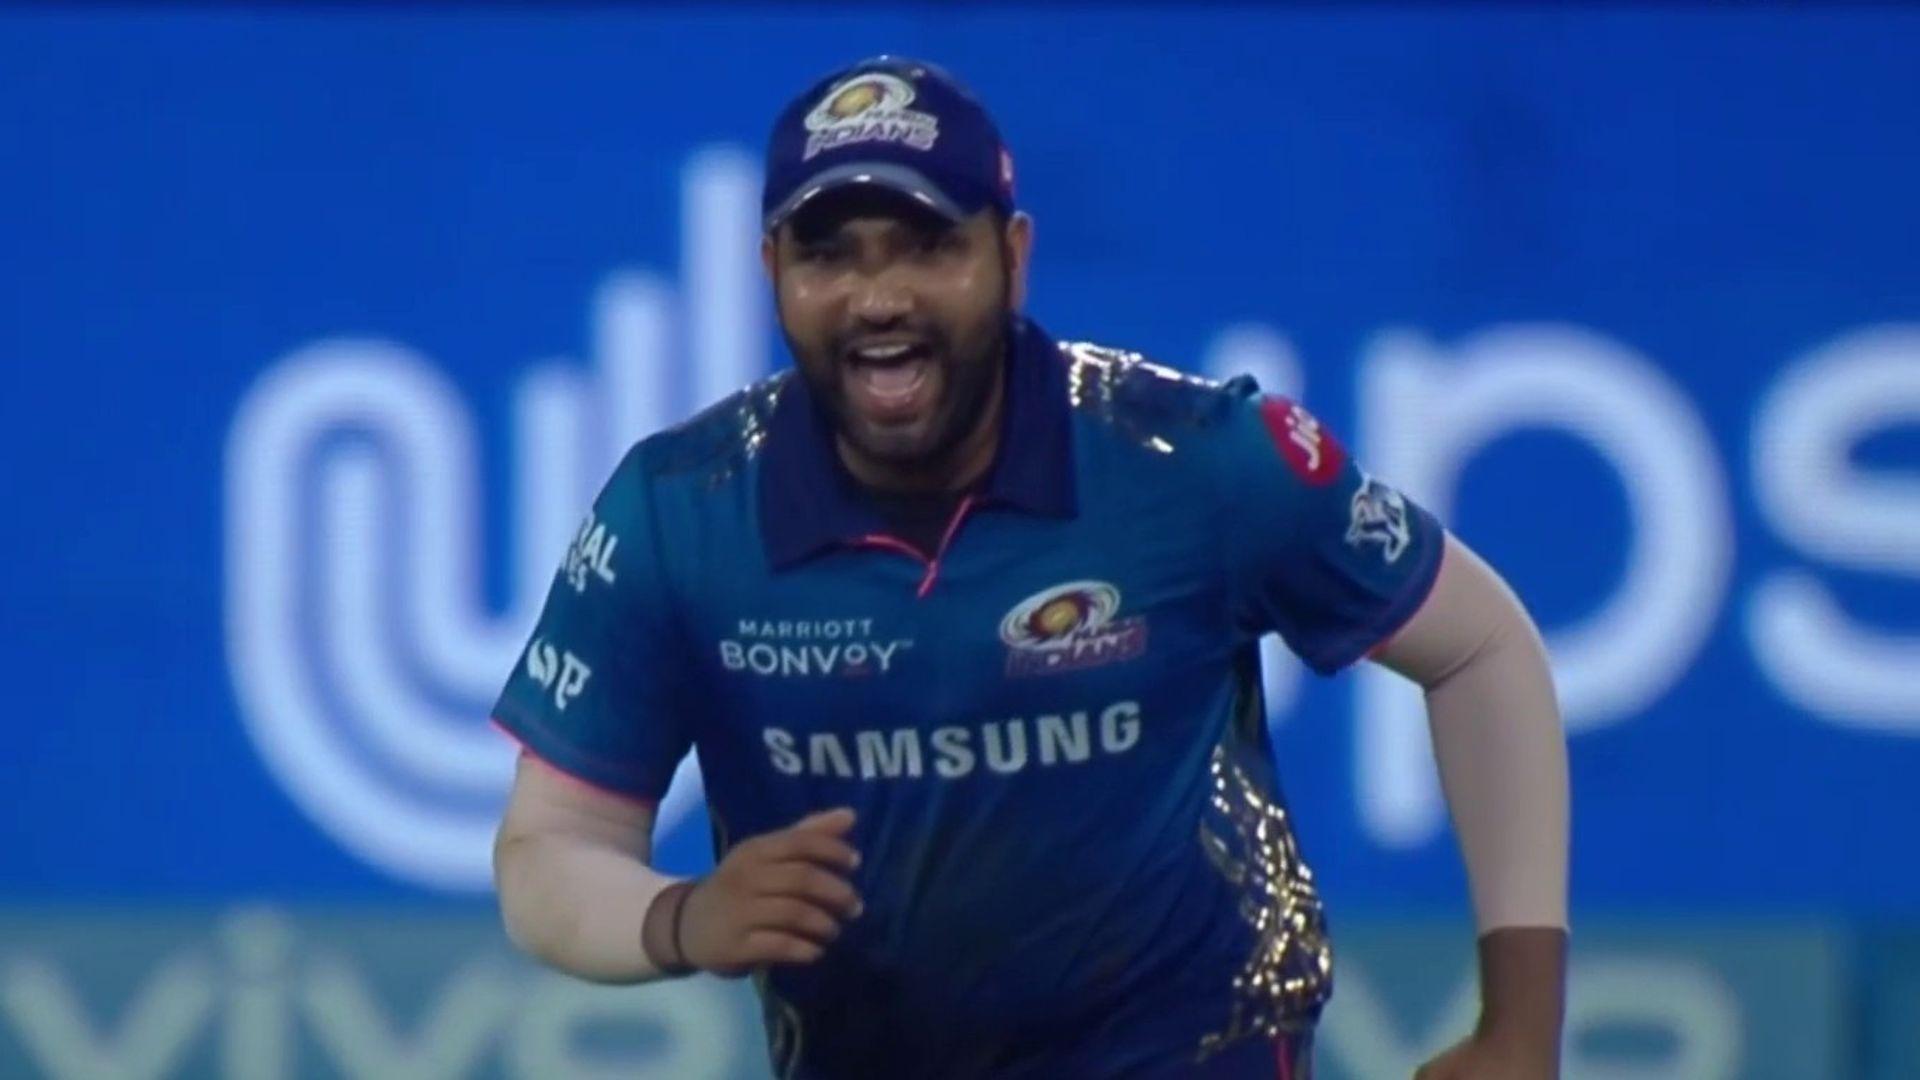 IPL to resume in UAE on September 19